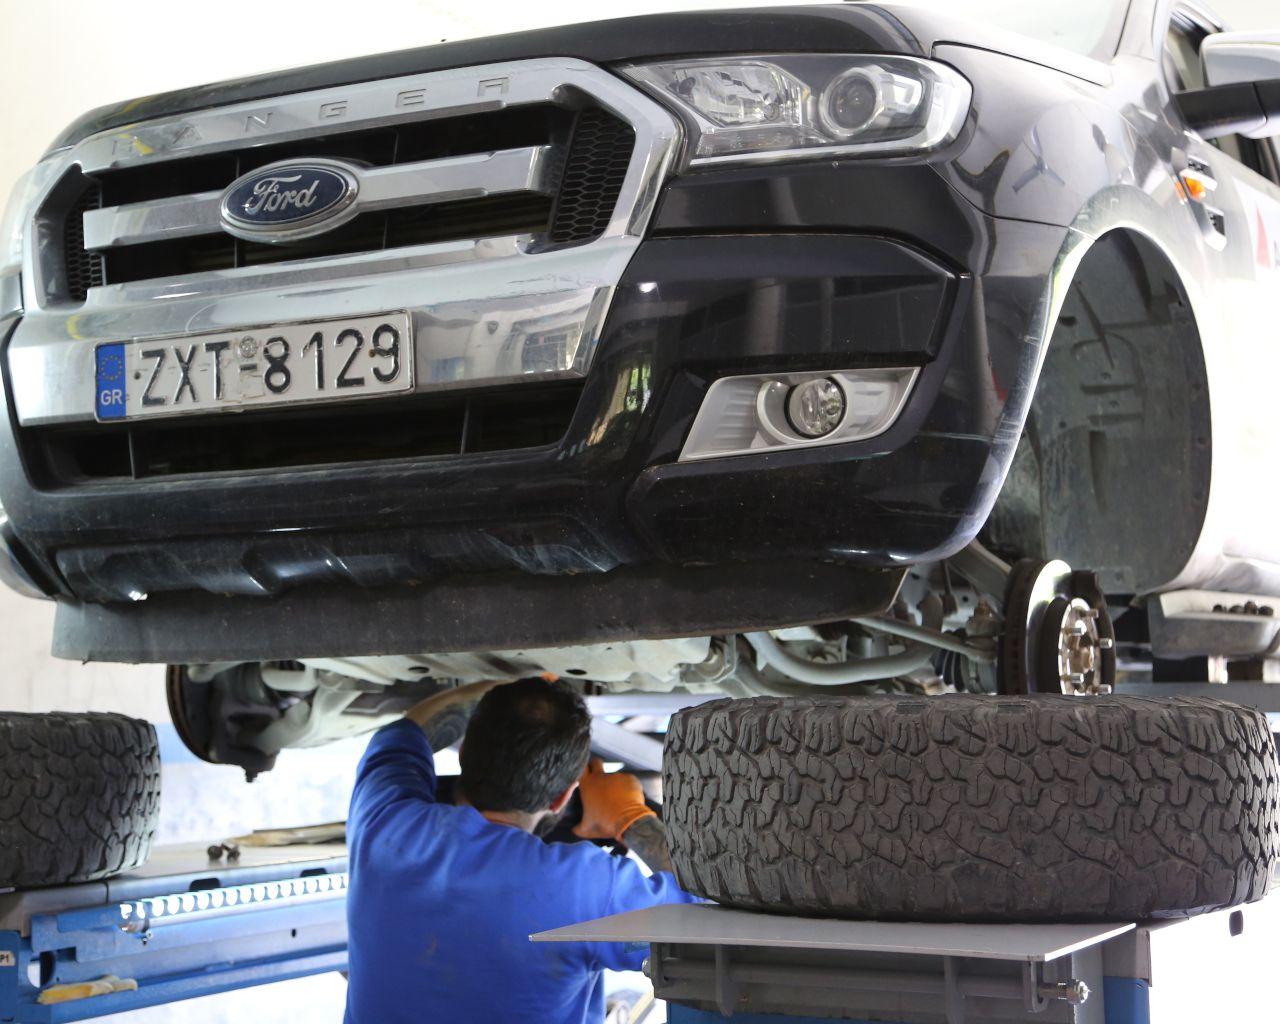 Ford Showroom Liapis Bros - Automotive Electronics